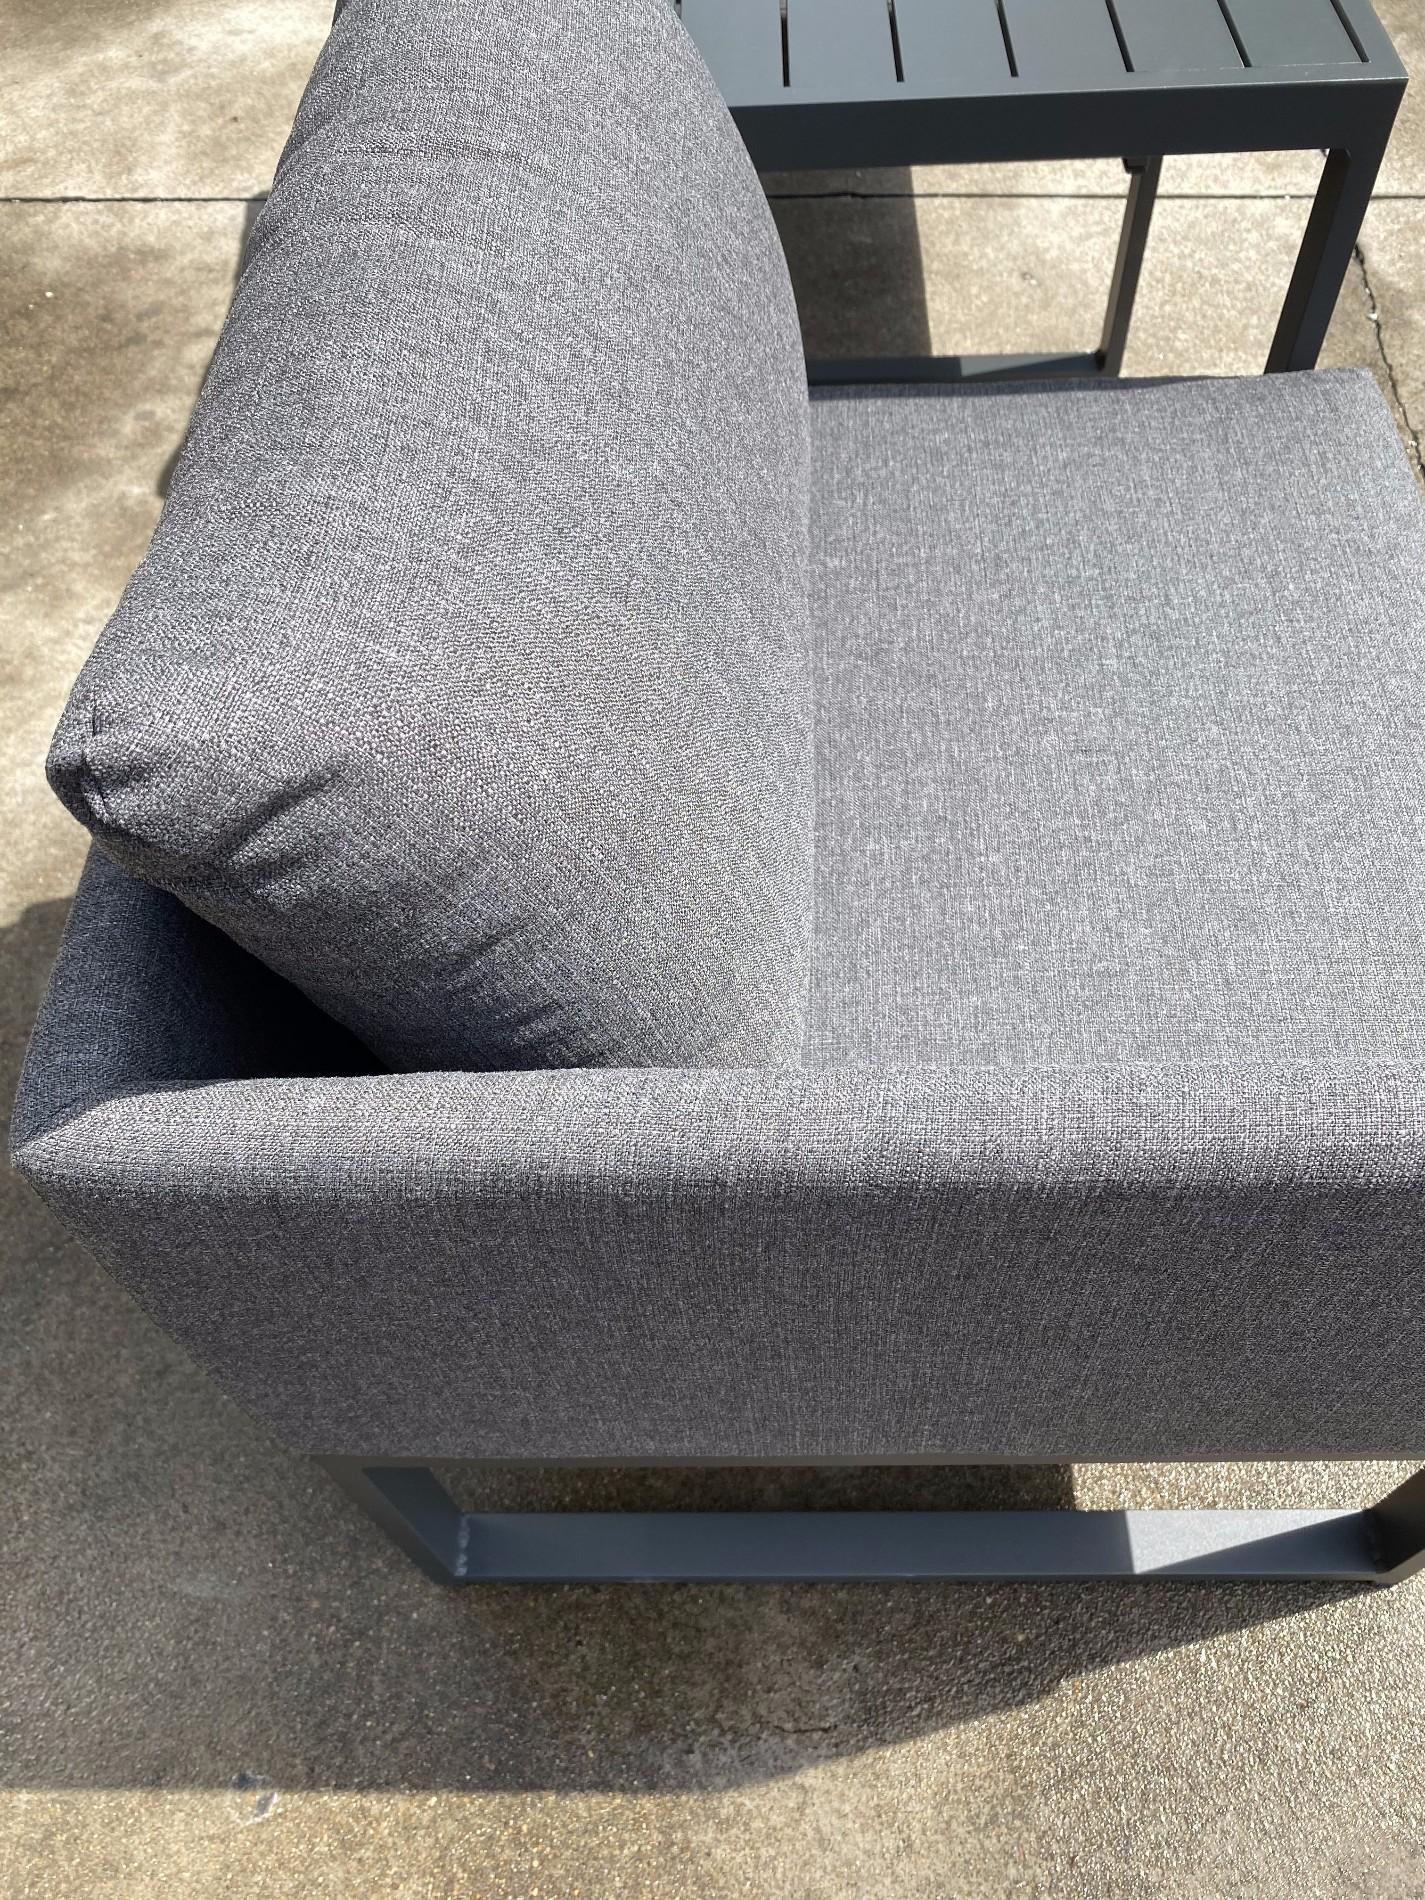 Leisure Patio Small Sofa Set Supplier Manufacturers, Leisure Patio Small Sofa Set Supplier Factory, Supply Leisure Patio Small Sofa Set Supplier